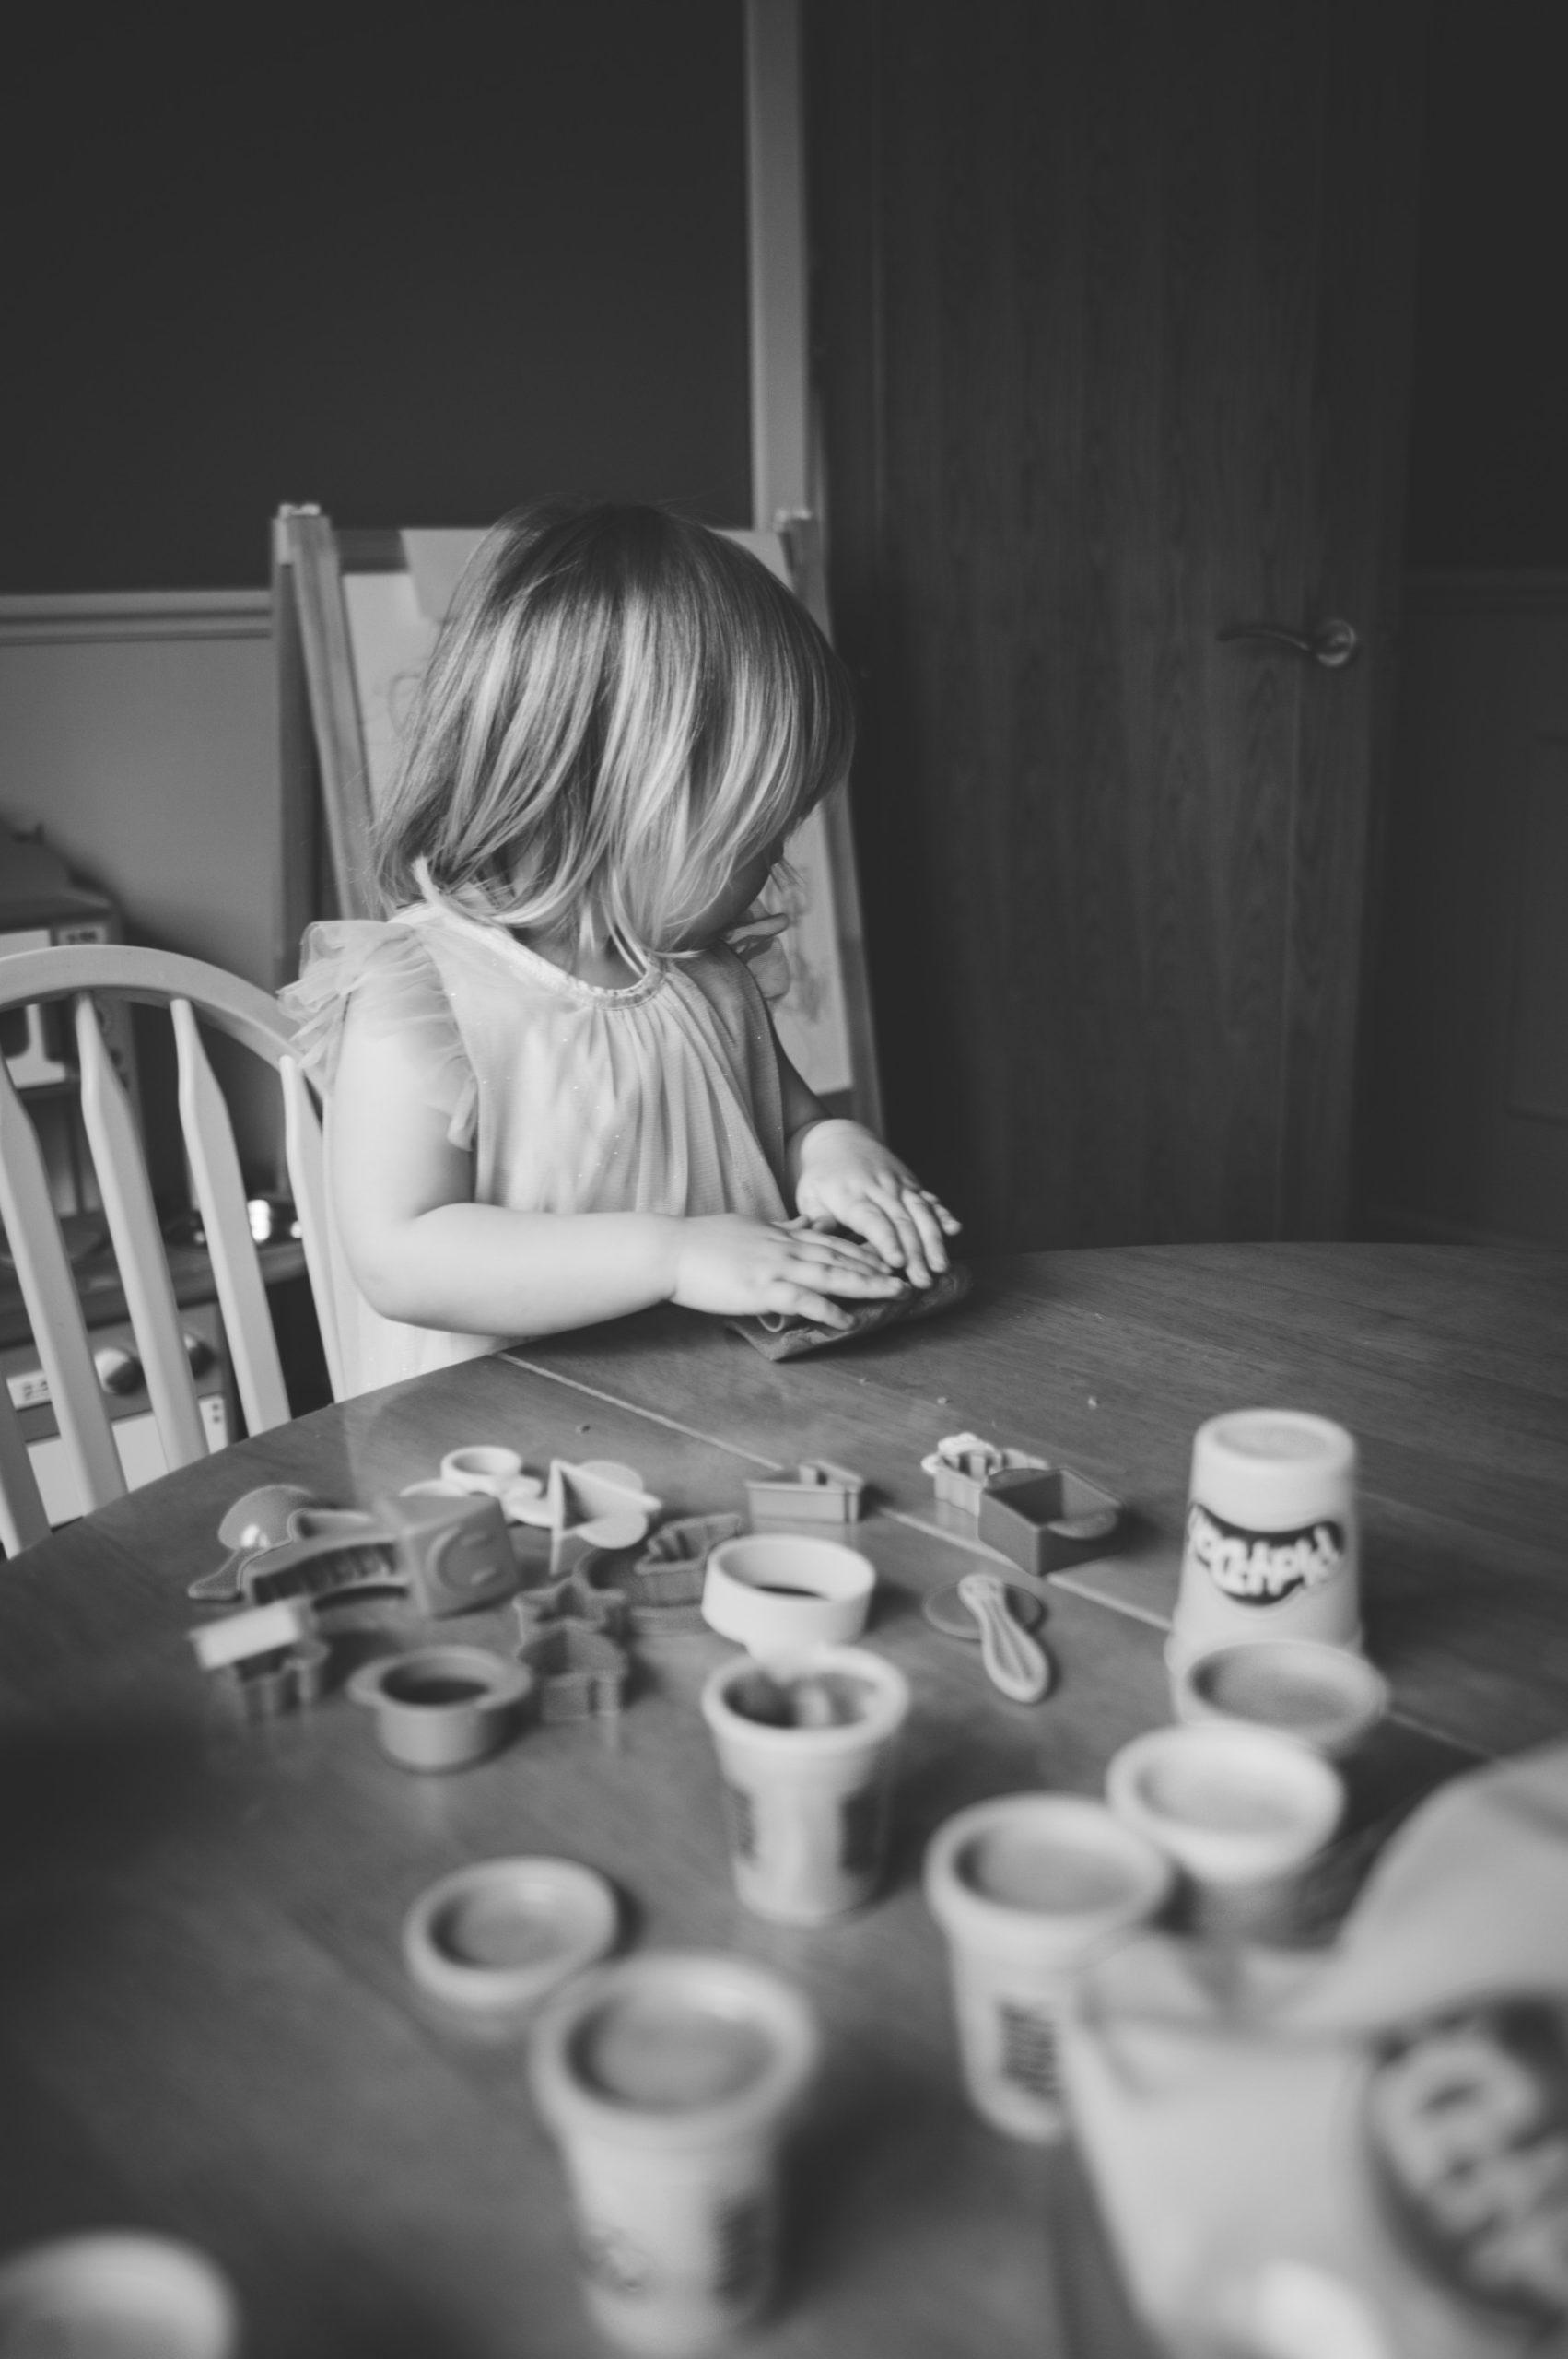 Lily Smartt O'Keffee PlayDoh Well Fed Photography